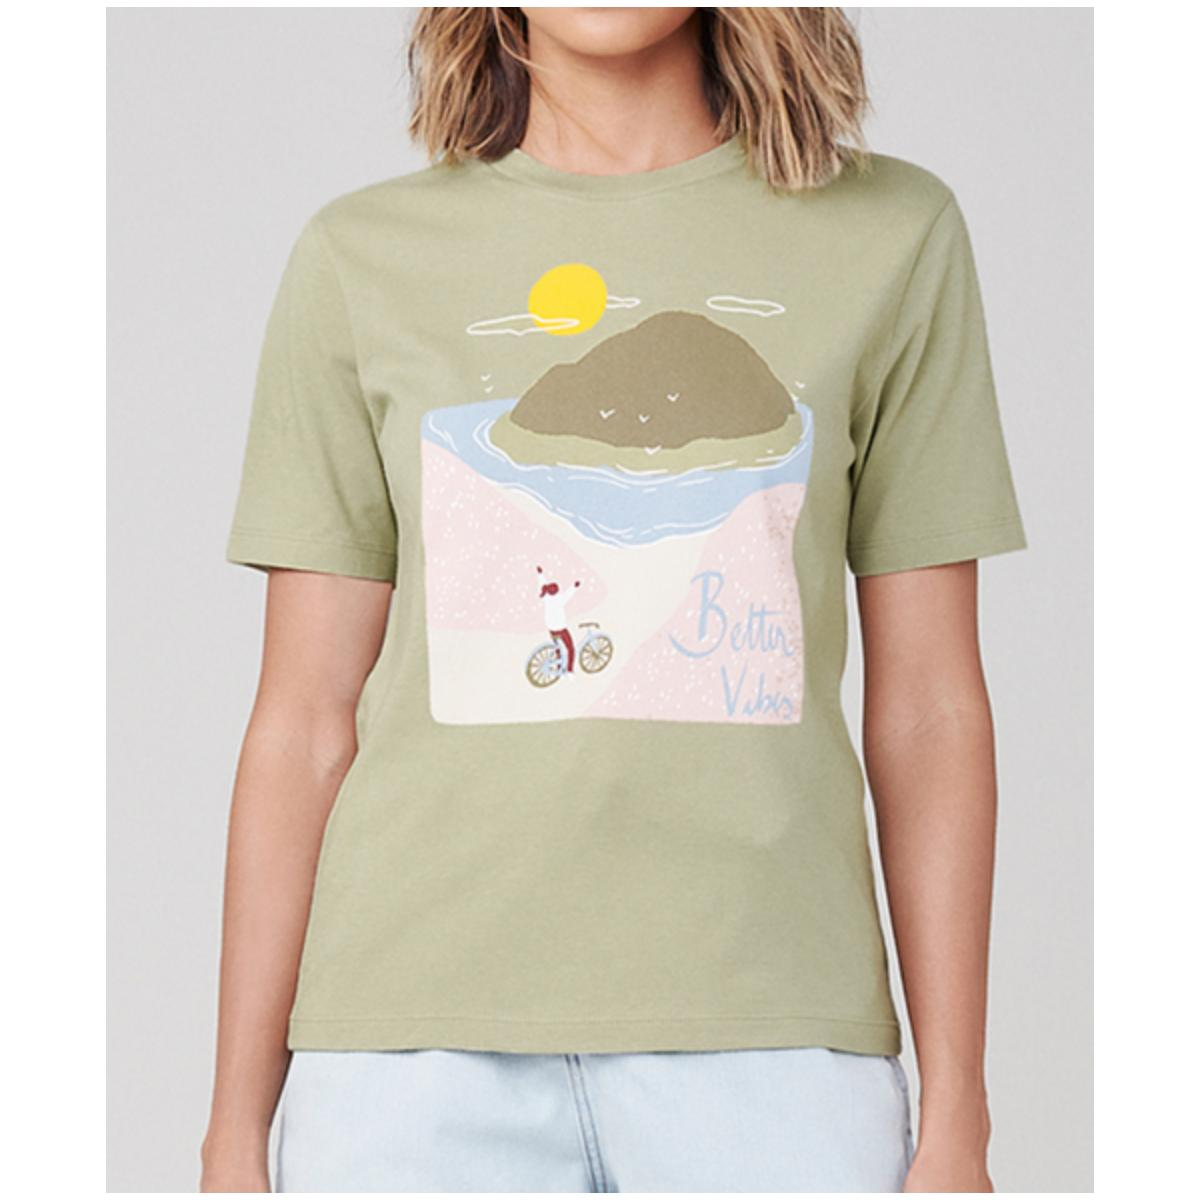 T-shirt Feminino Dzarm 6rz3 Wg6en Verde